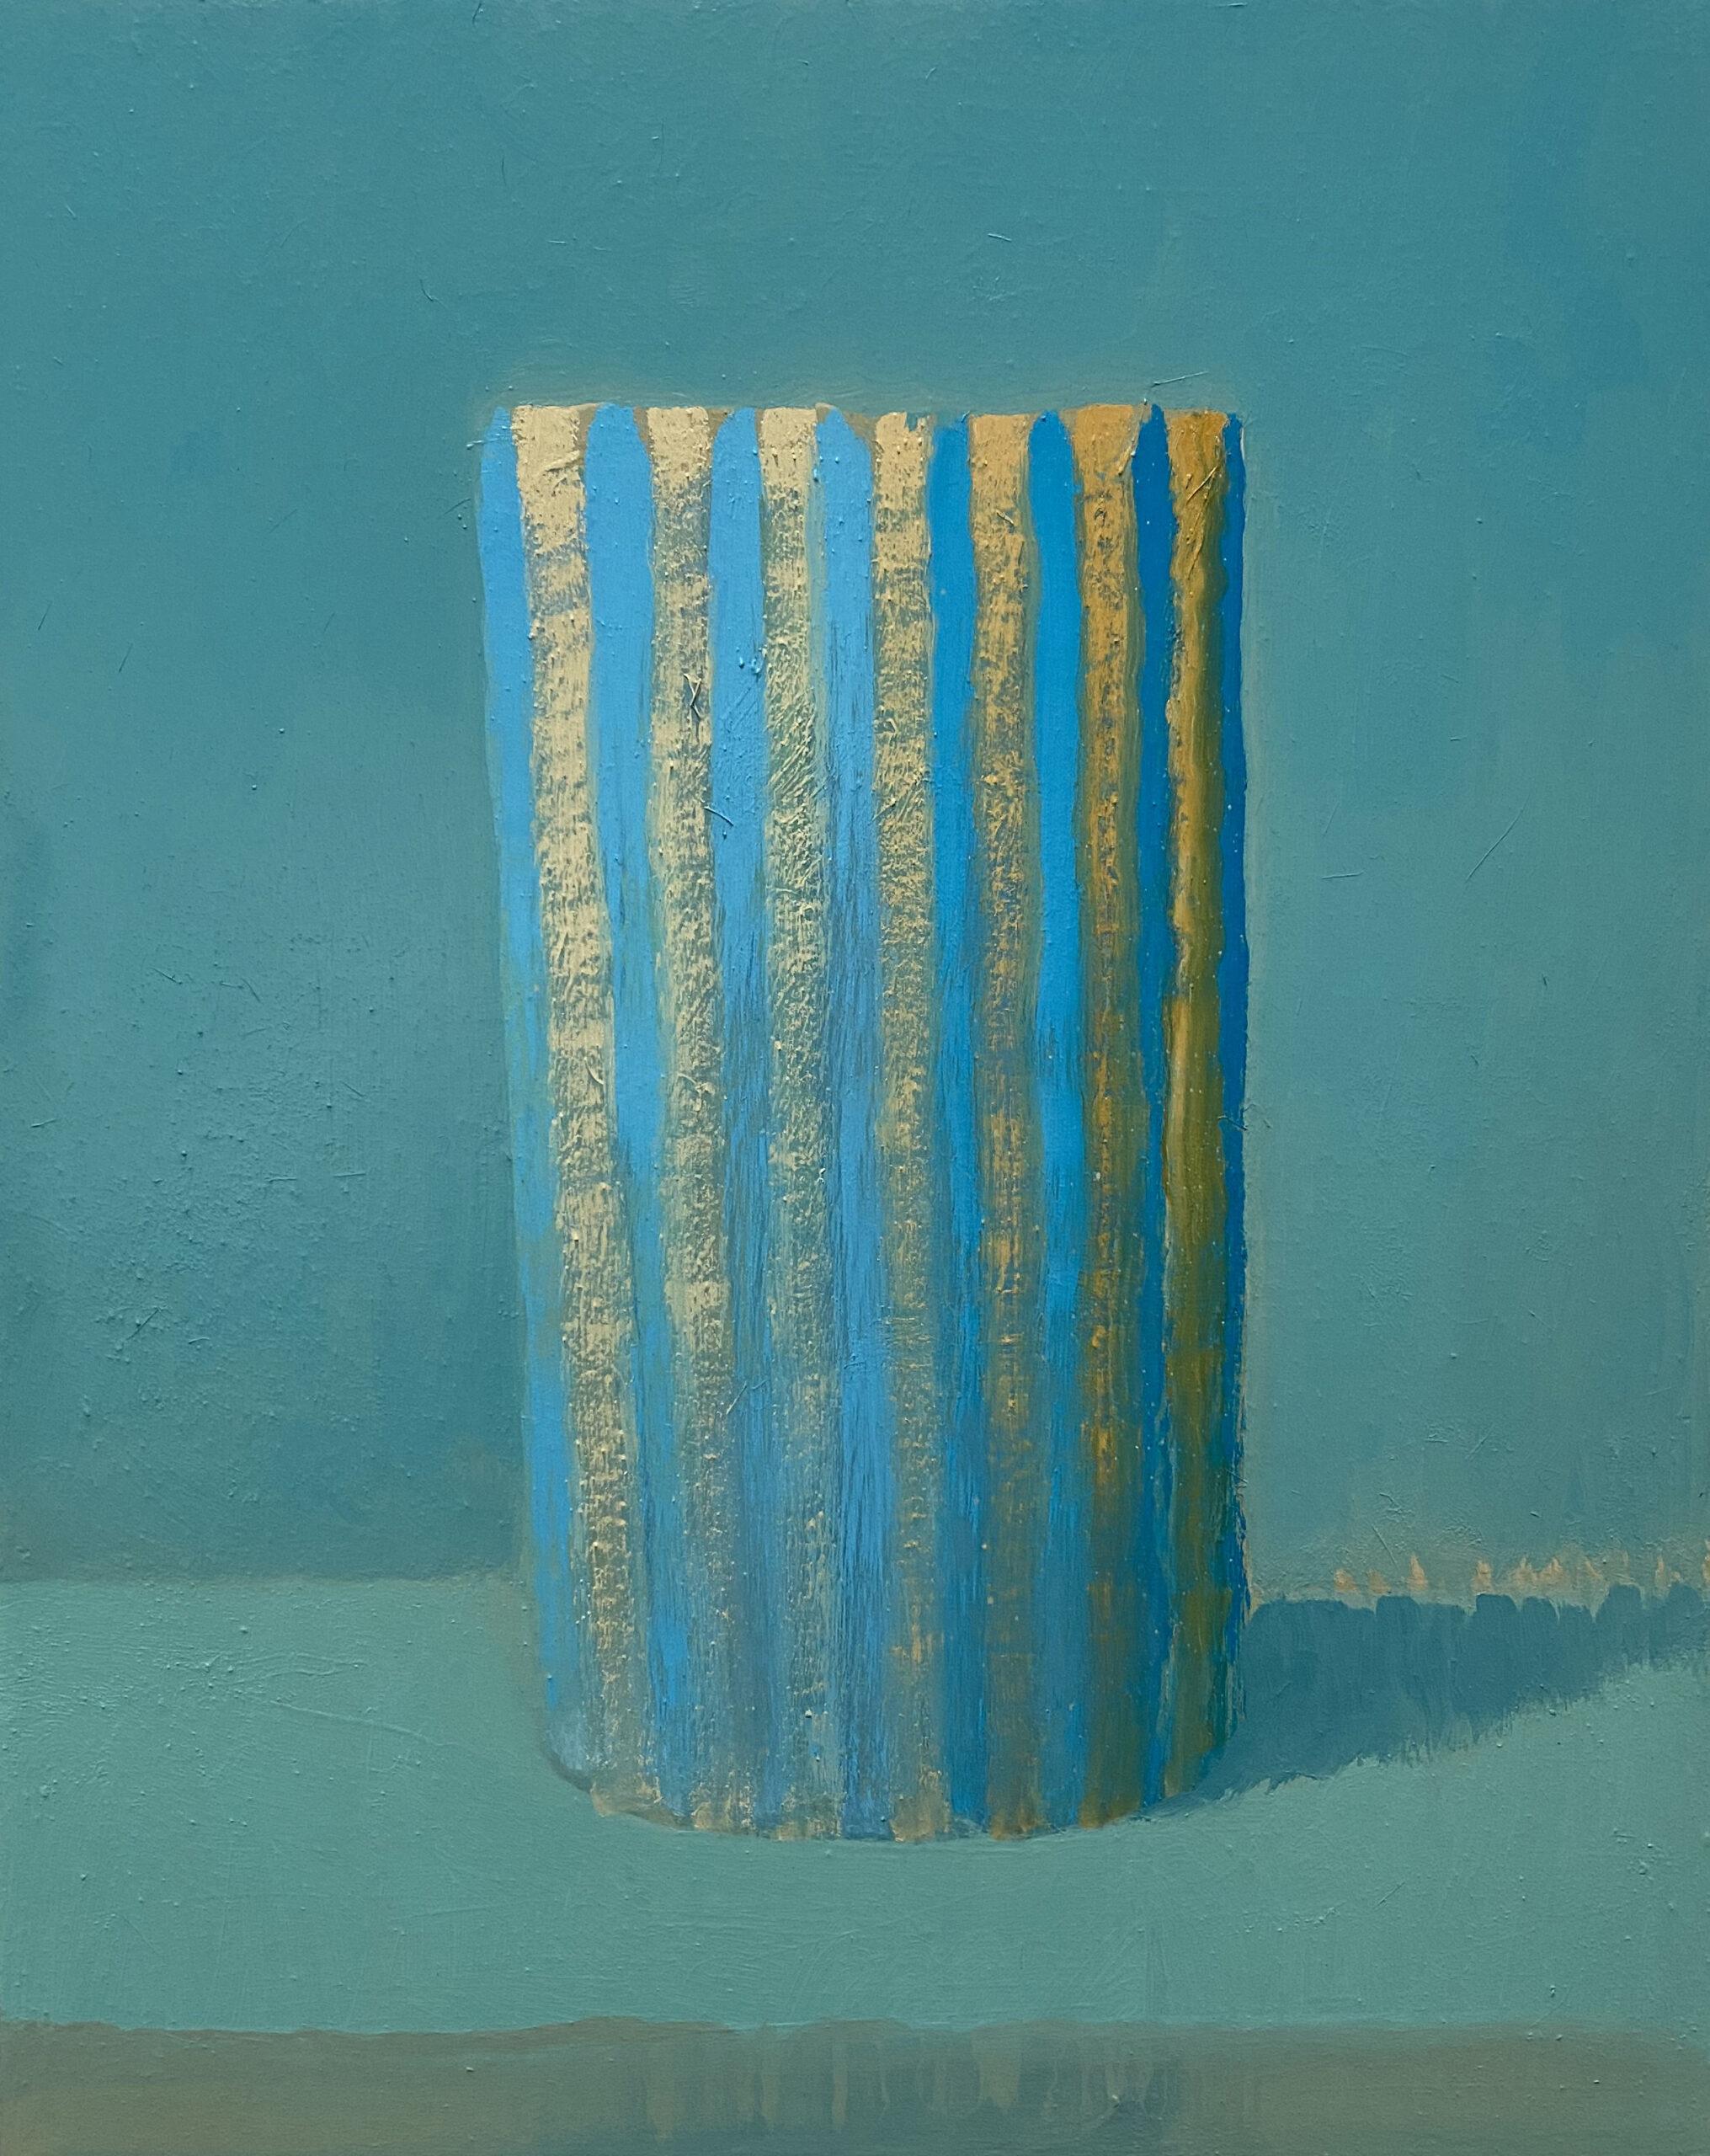 Becher majestätisch | 2021 | Öl / Holz | 30 x 24 cm